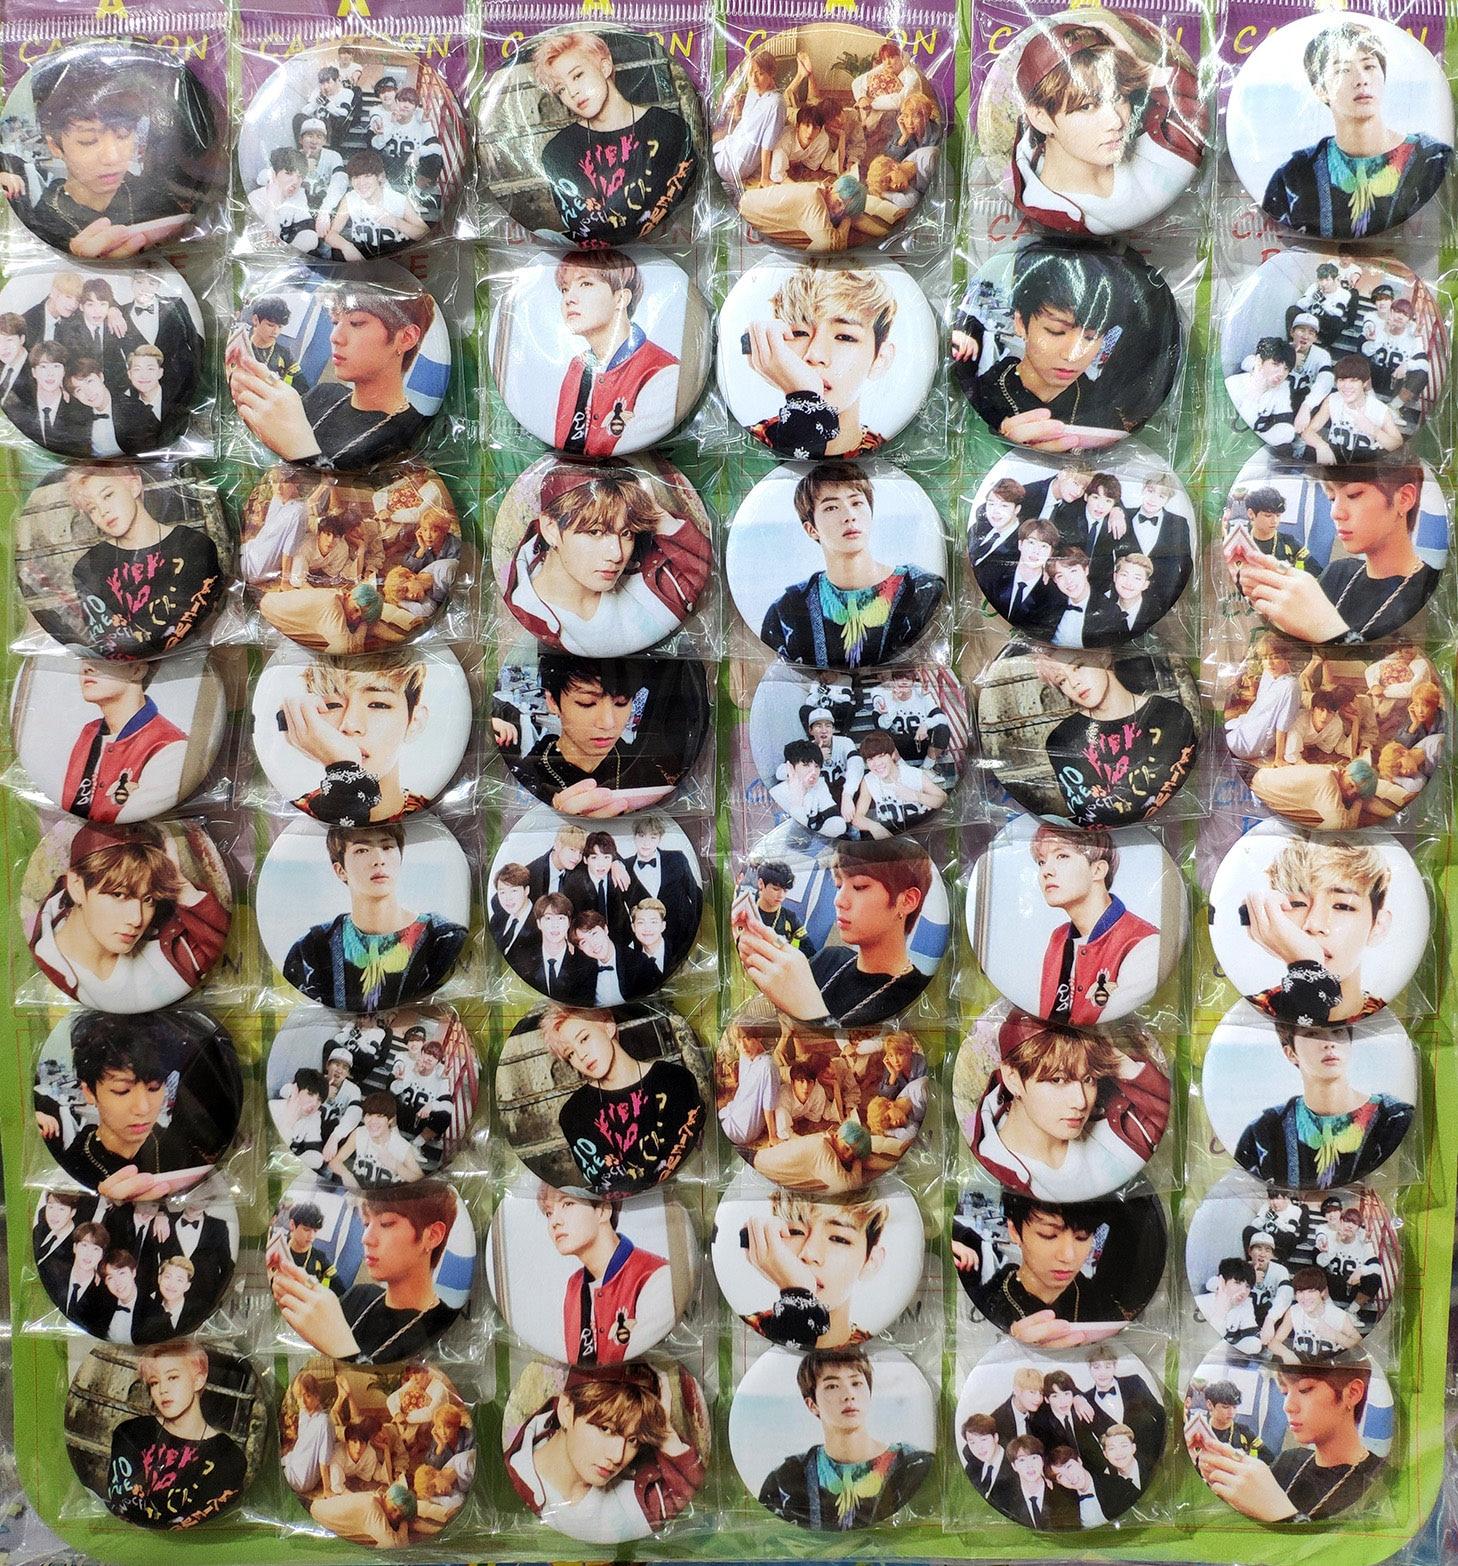 Love merci Bangtan Boys kpop group # A 45MM 16/24/32/40/48 pièces lot broche dos BADGE bouton broche pour sac cadeau jouet tissu